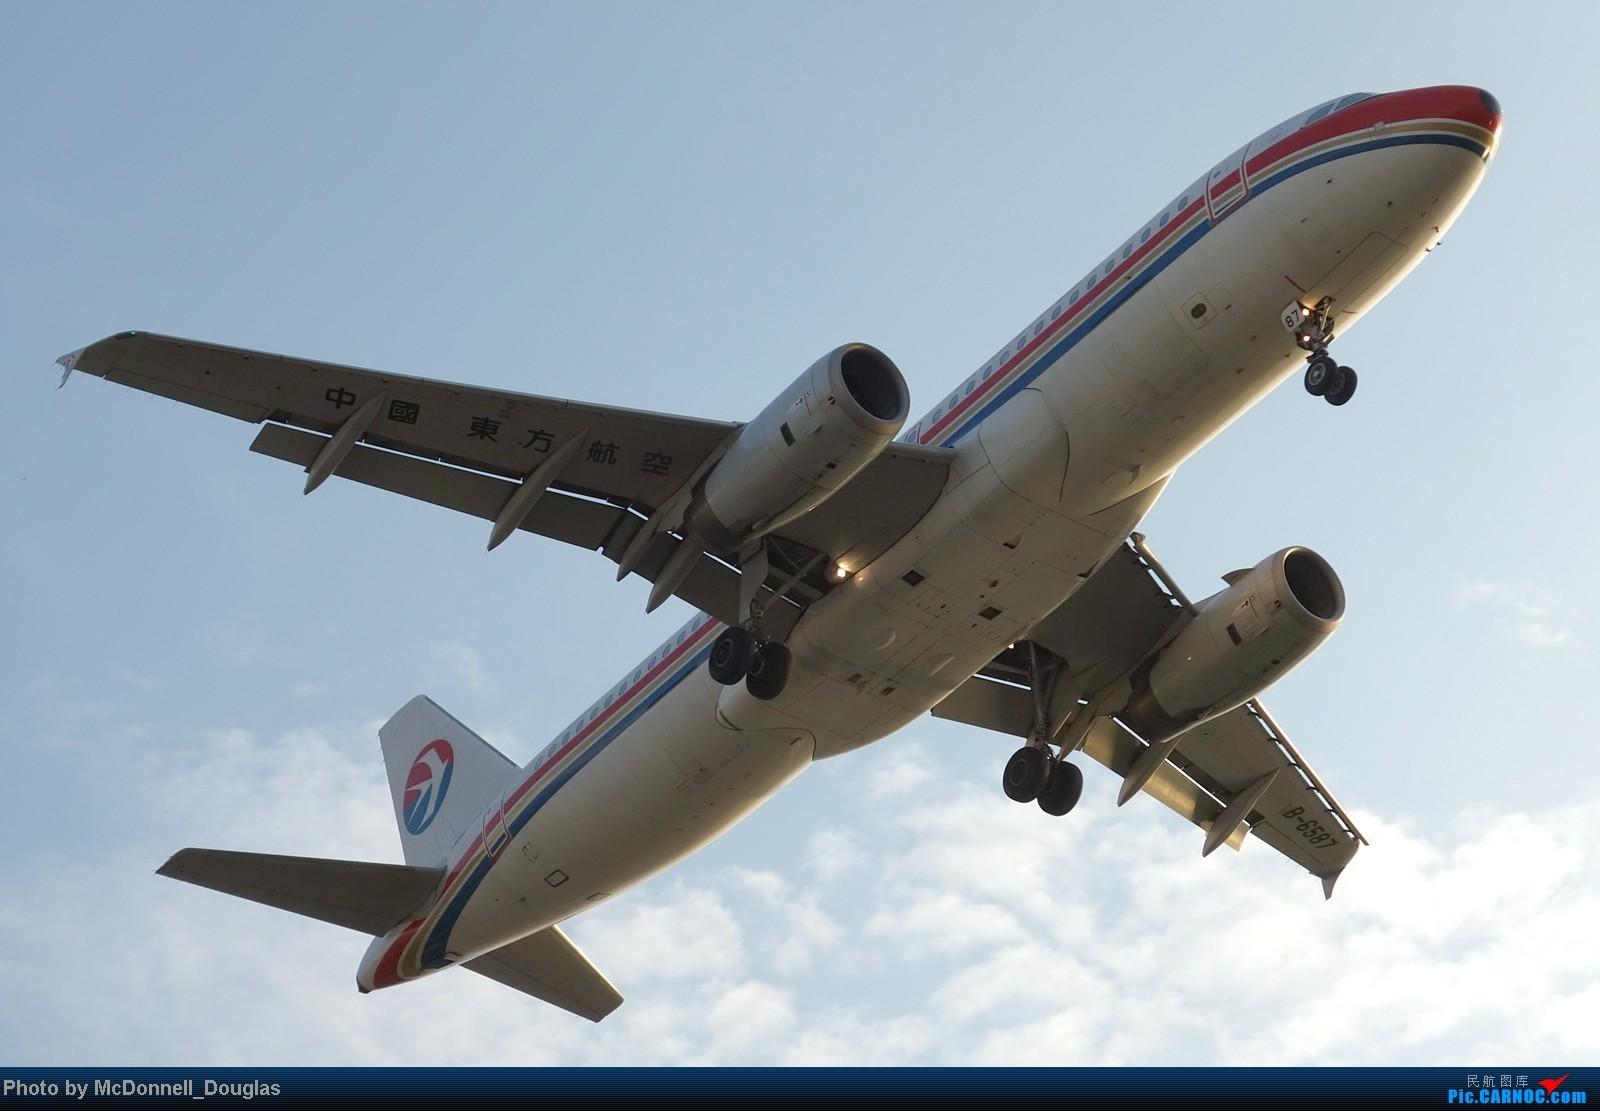 Re:[原创]【上海飞友会】ZSSS杂图一组 AIRBUS A320-200 B-6587 中国上海虹桥机场